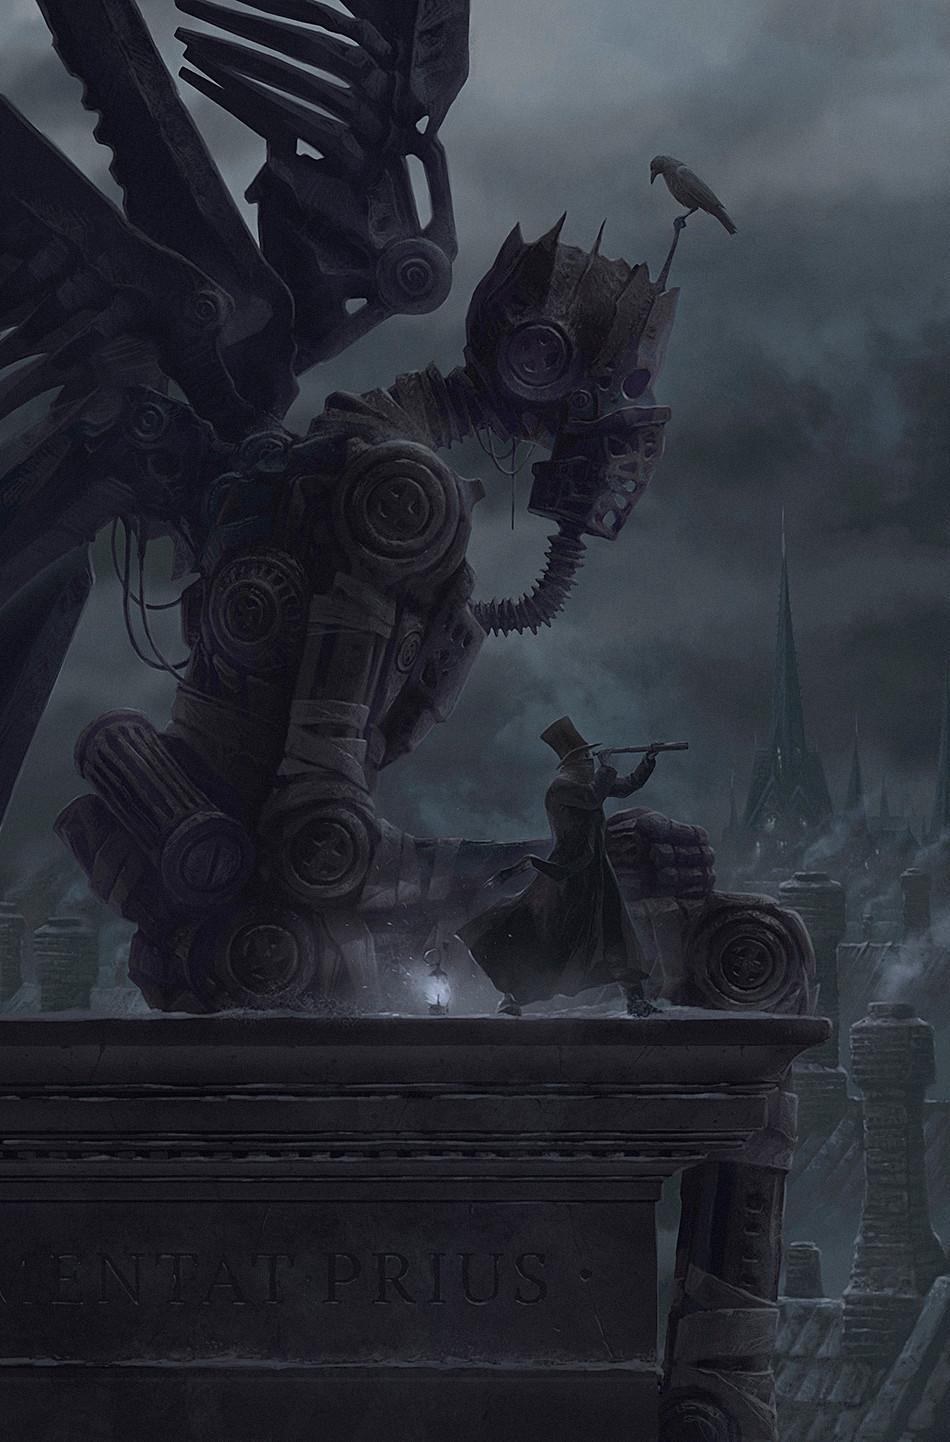 Digital Art Fantasy Art Alexey Egorov Frankenstein Fantasy City Robot 950x1442